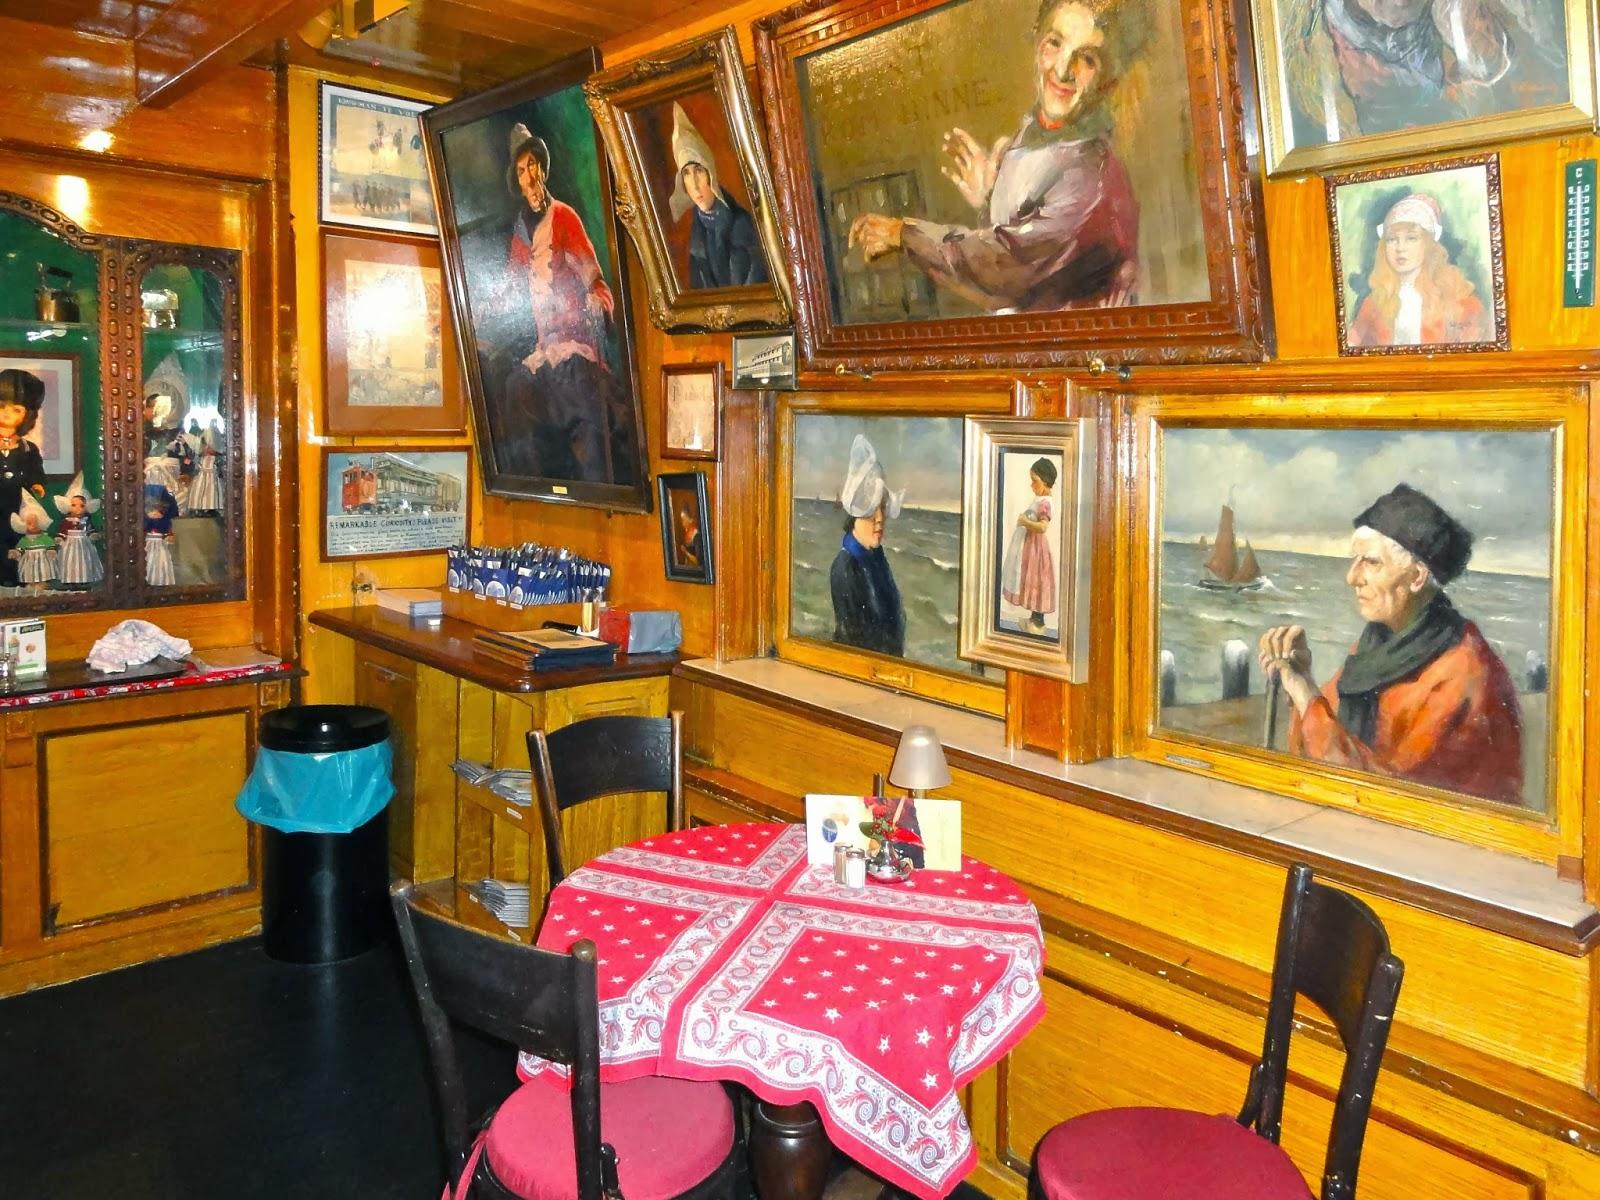 BZN had to have a band name - Volendam - Hotel Spaander interior